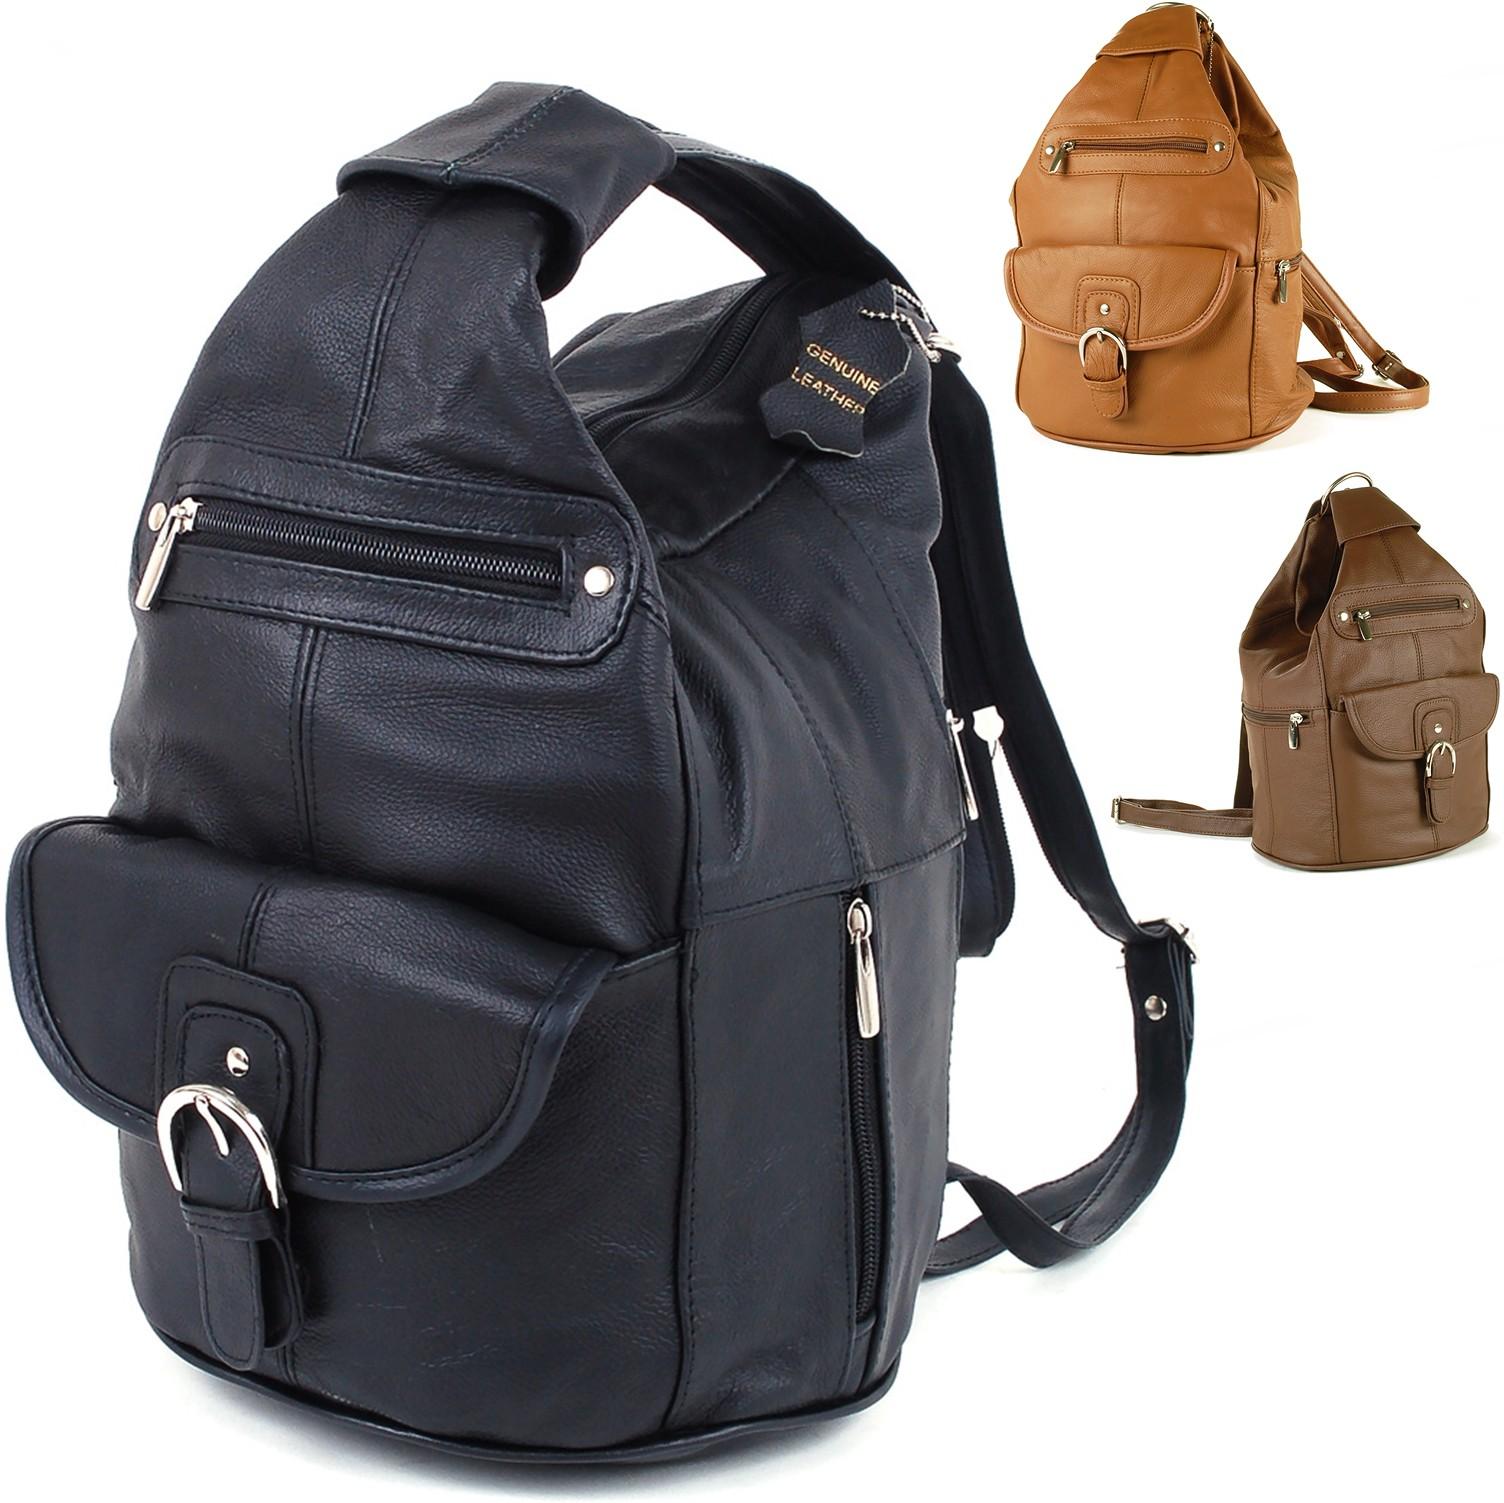 Womens Leather Backpack Purse Sling Shoulder Bag Handbag 3 in 1 Convertible  New b53ecedffc5ae